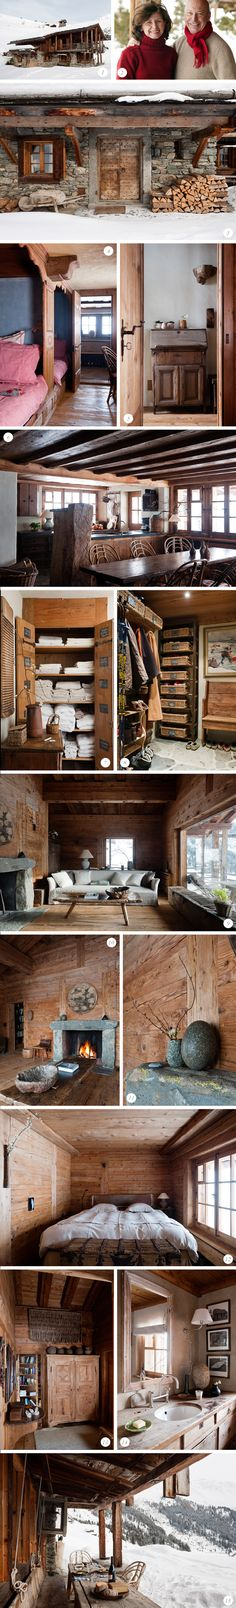 rustic and cozy winter cabin